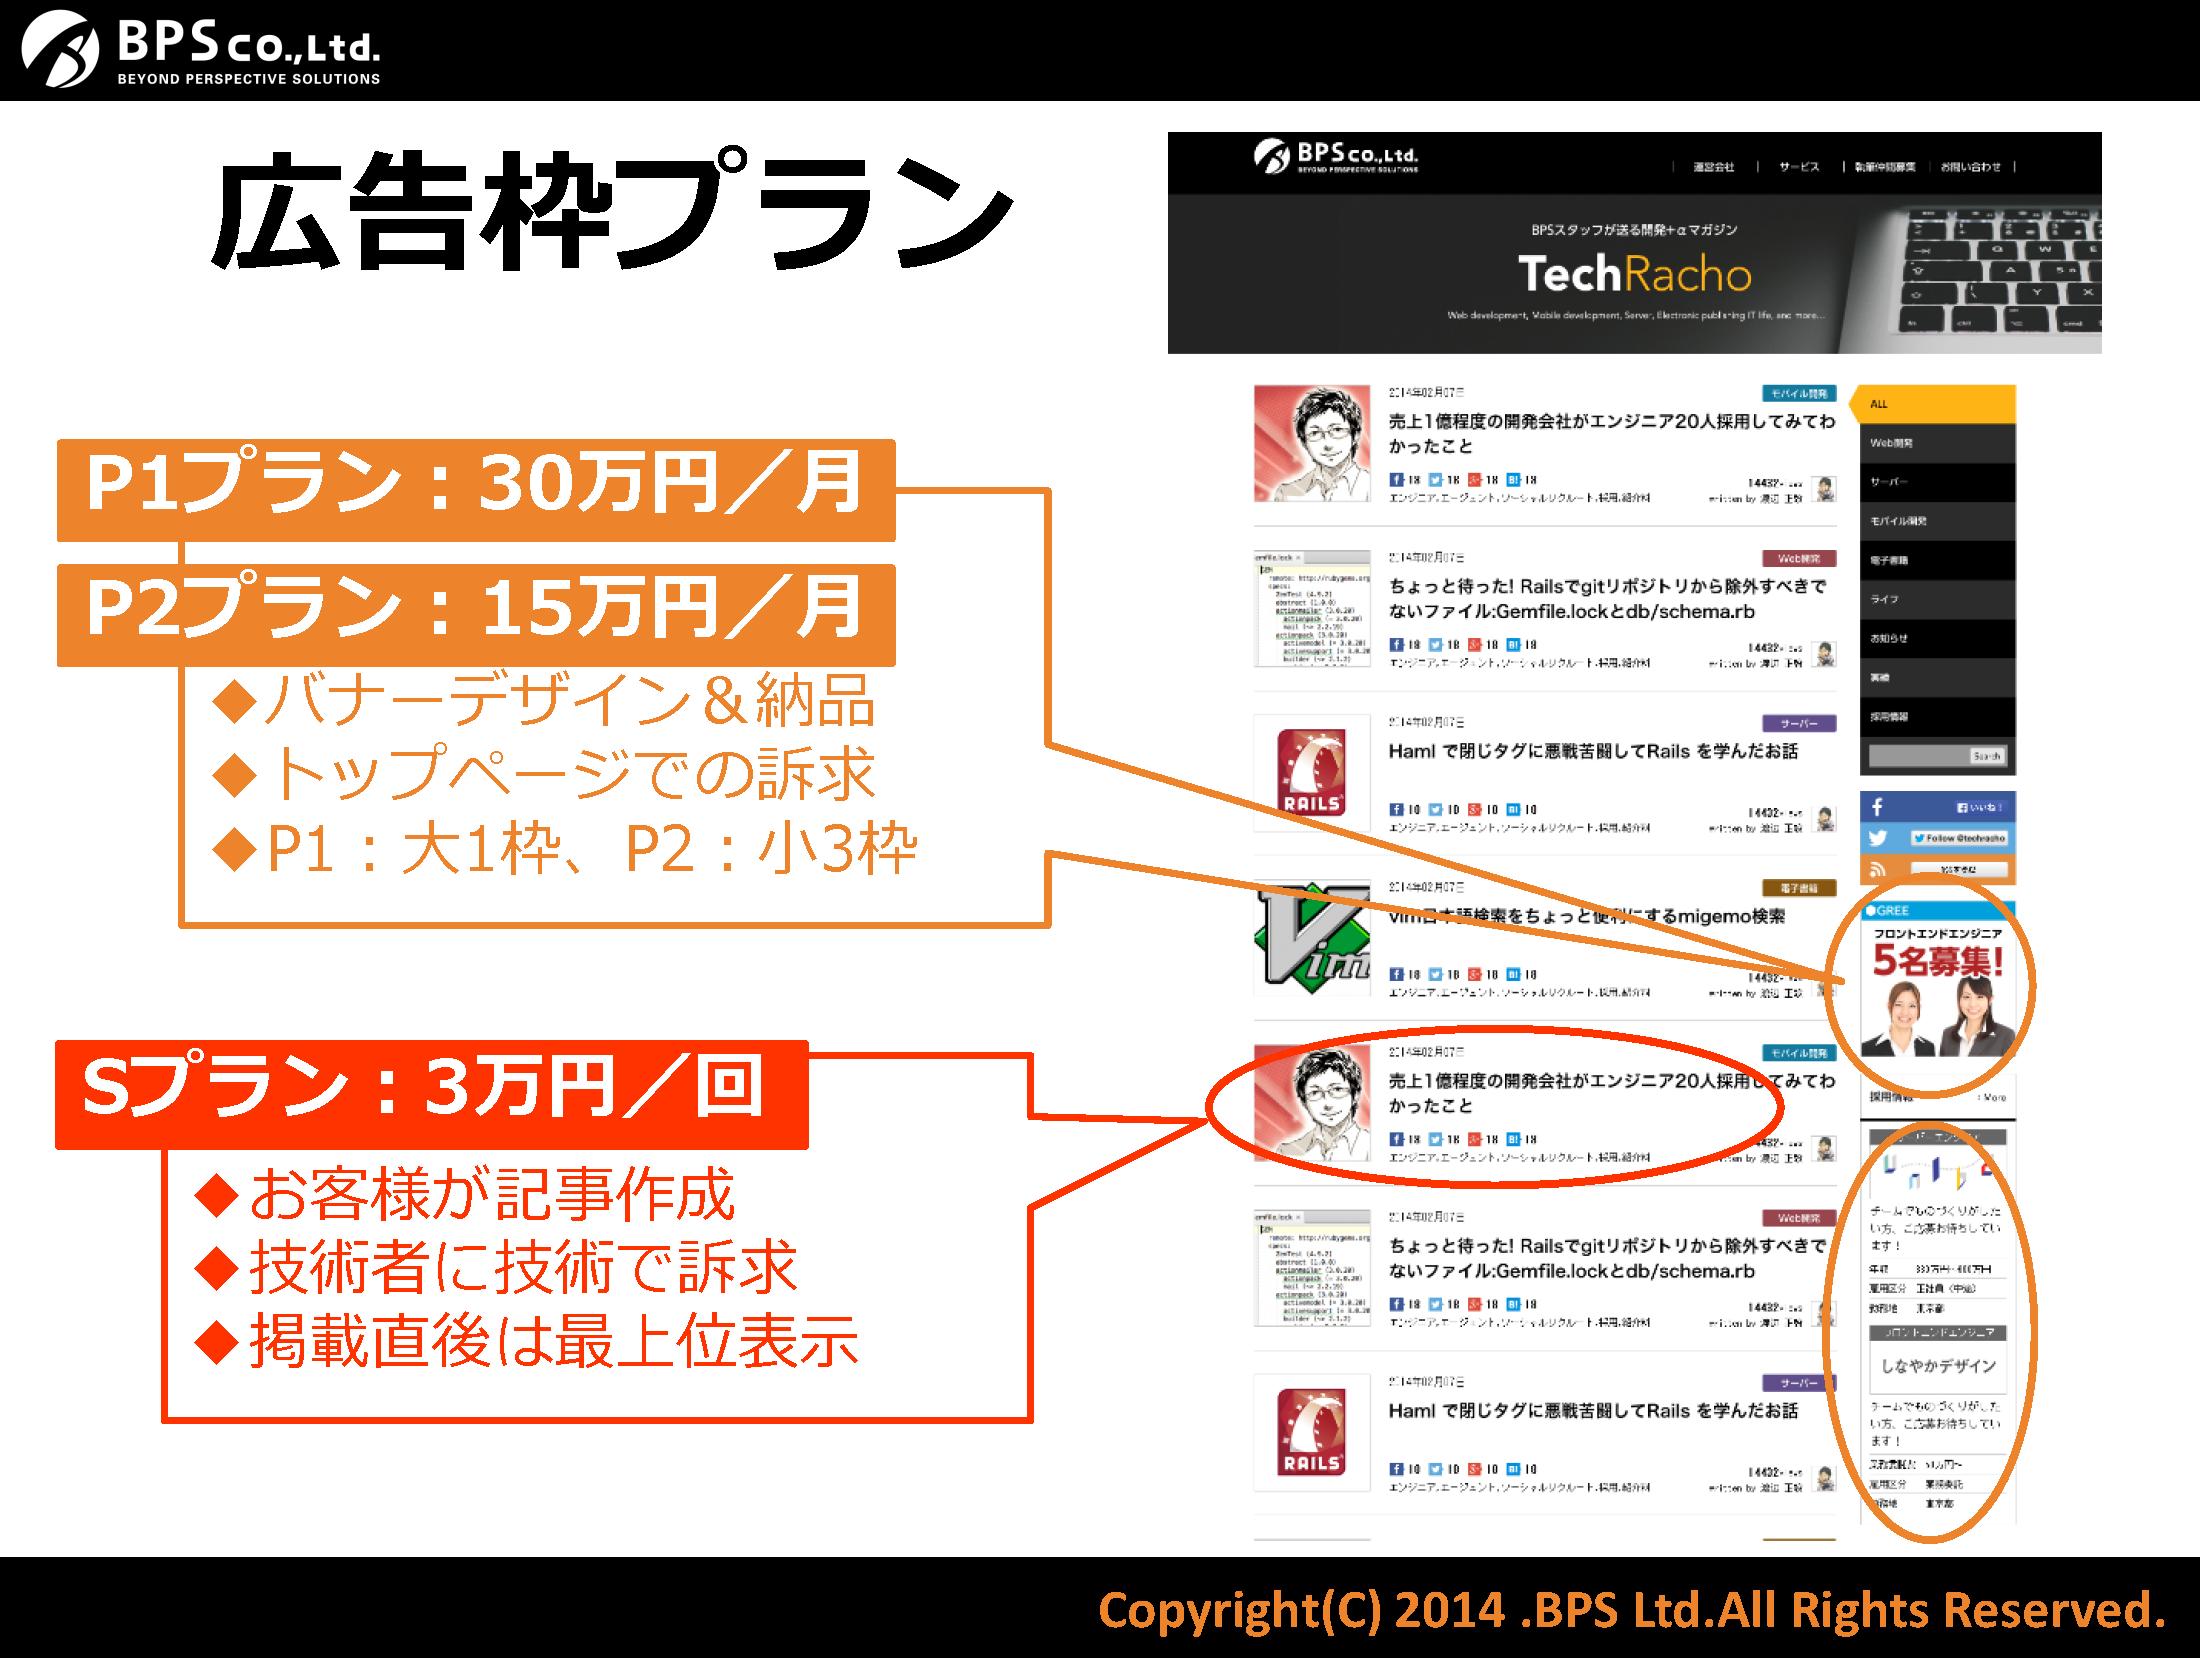 techracho_媒体資料_09